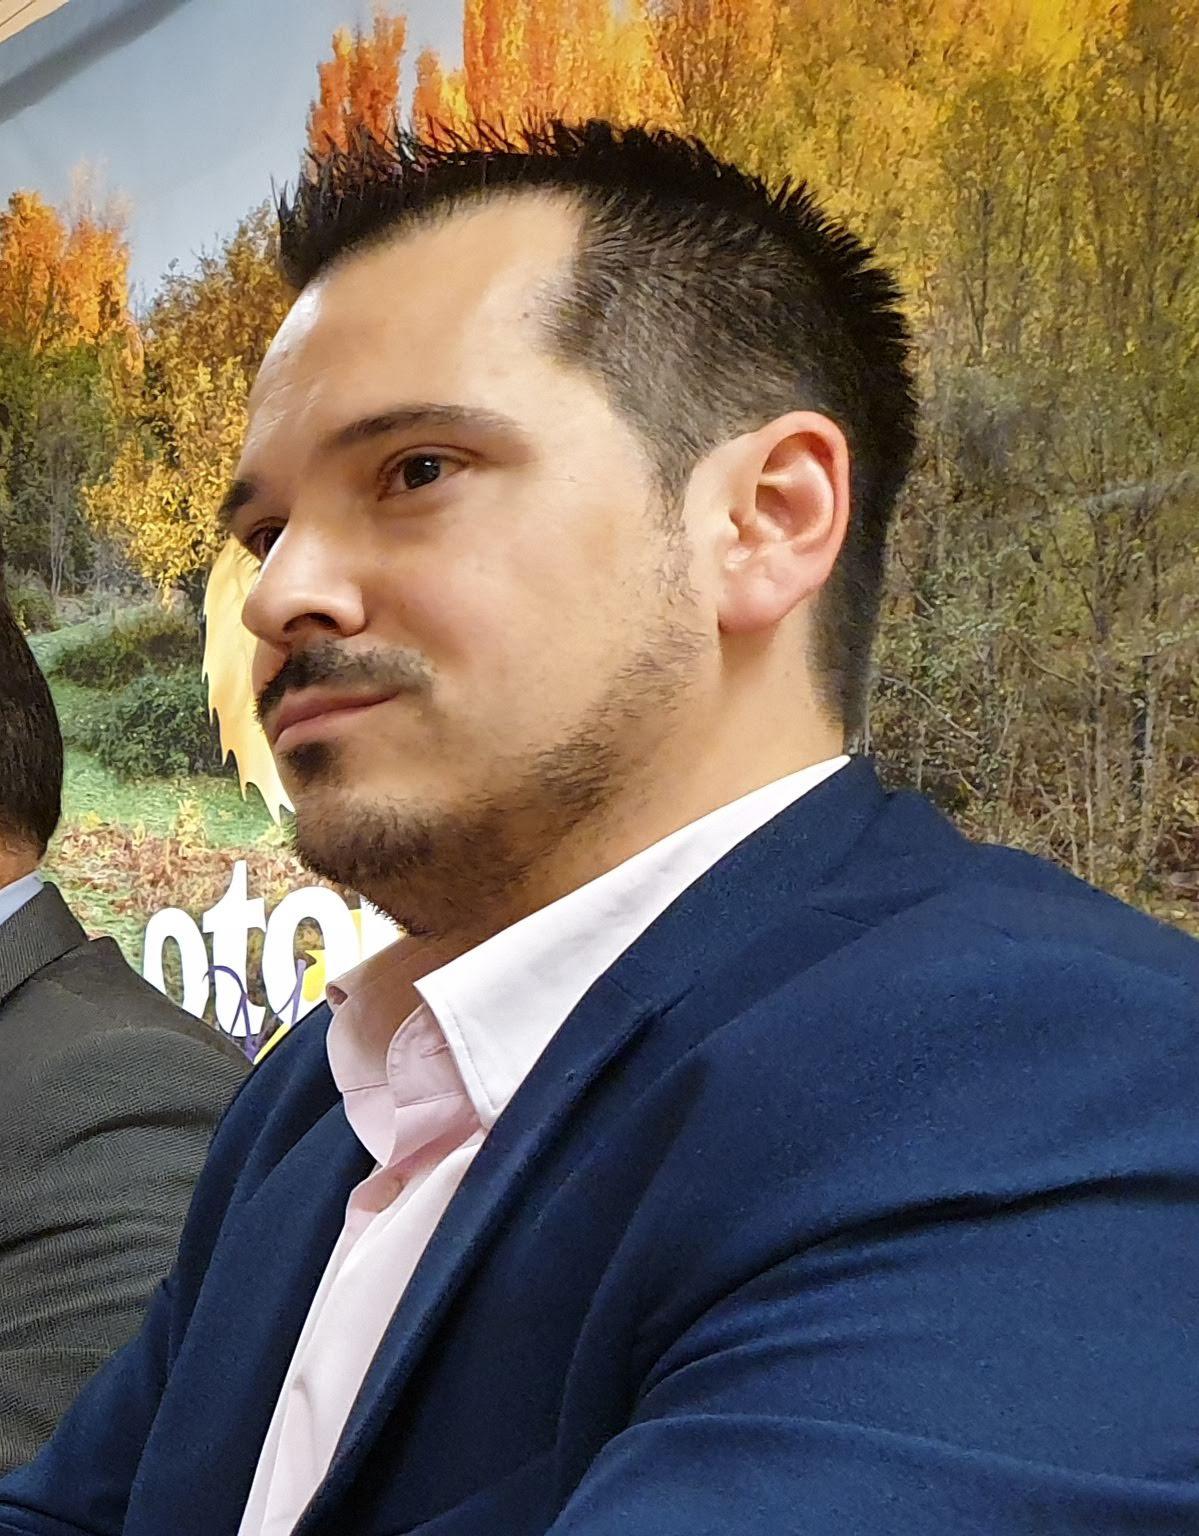 Óscar Mateos del Valle del Ambroz DIVA